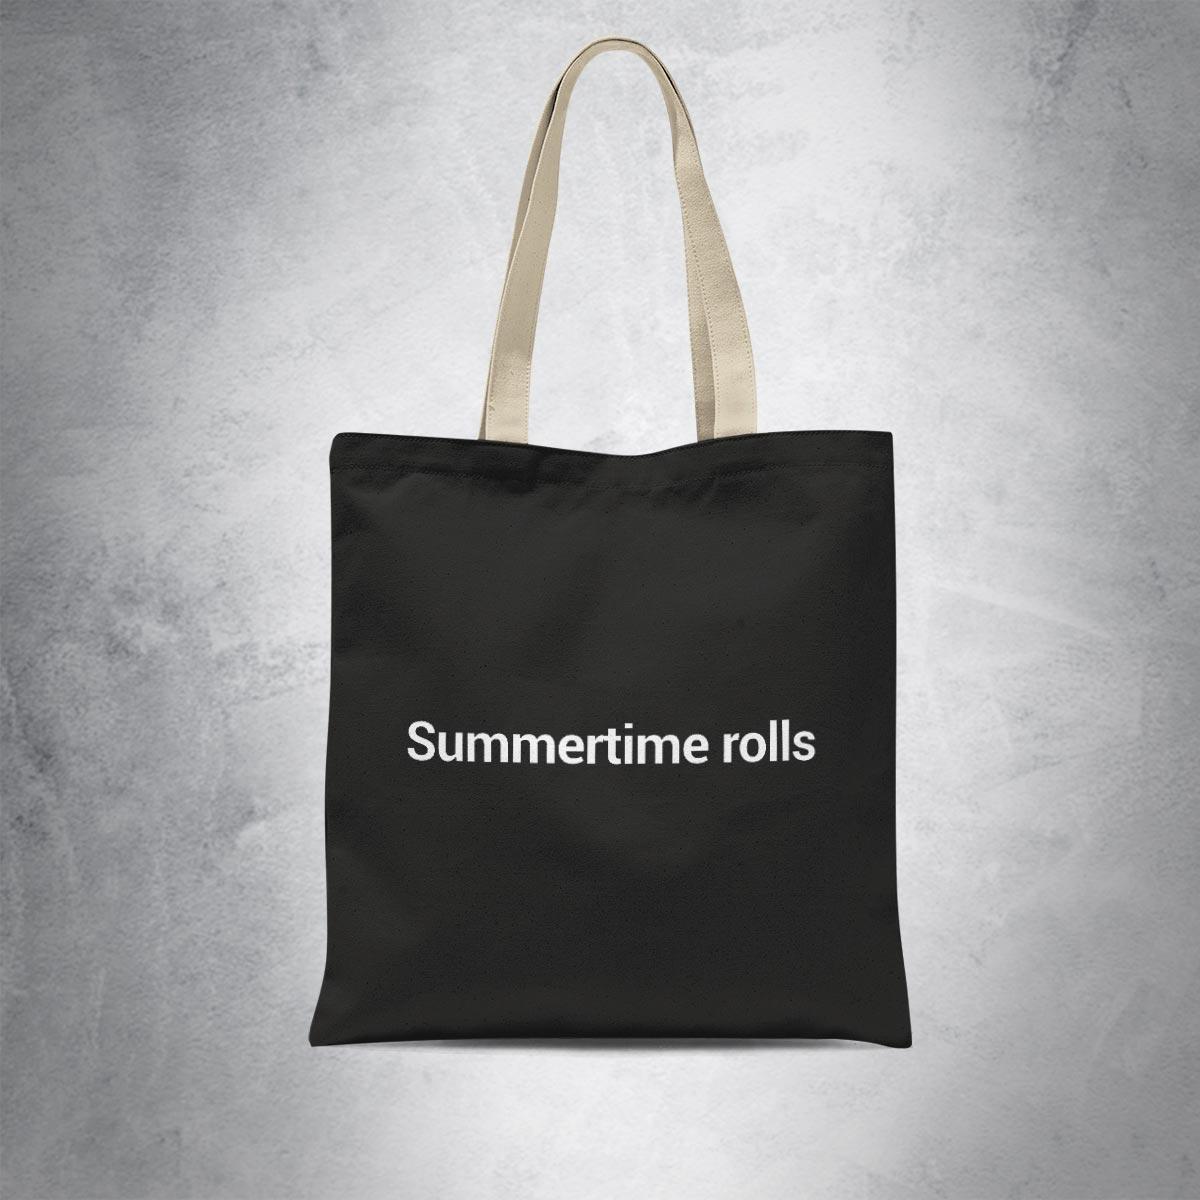 JANE'S ADDICTION - Summertime rolls